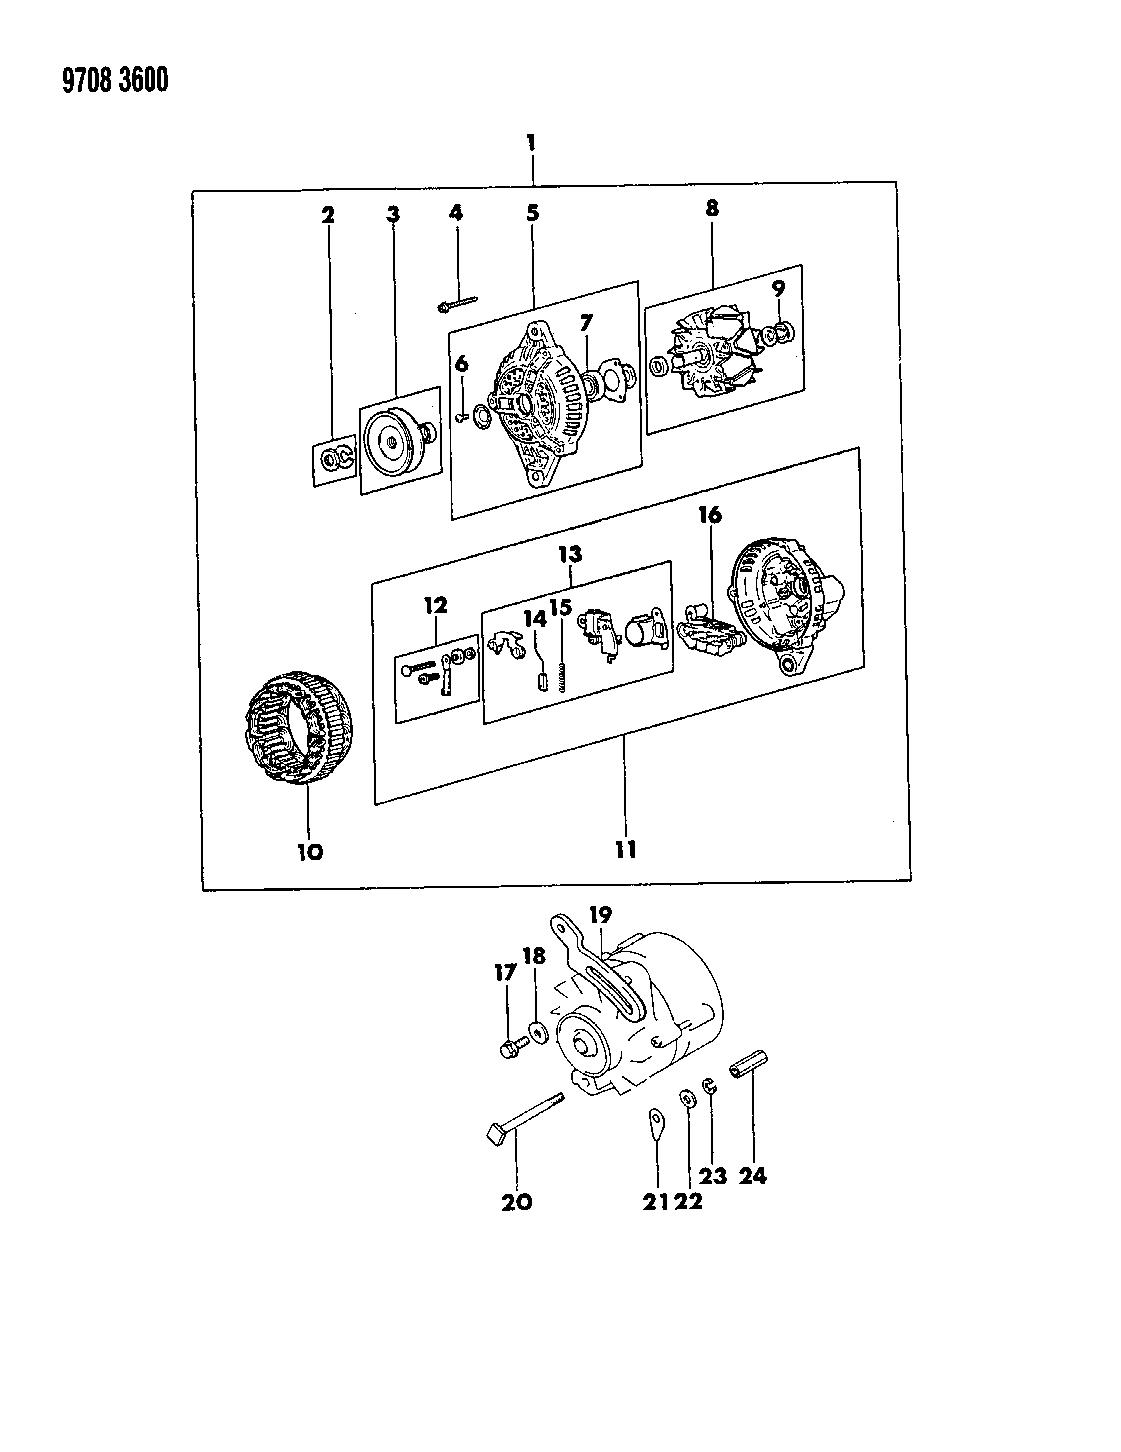 Chrysler Conquest Wiring Diagram